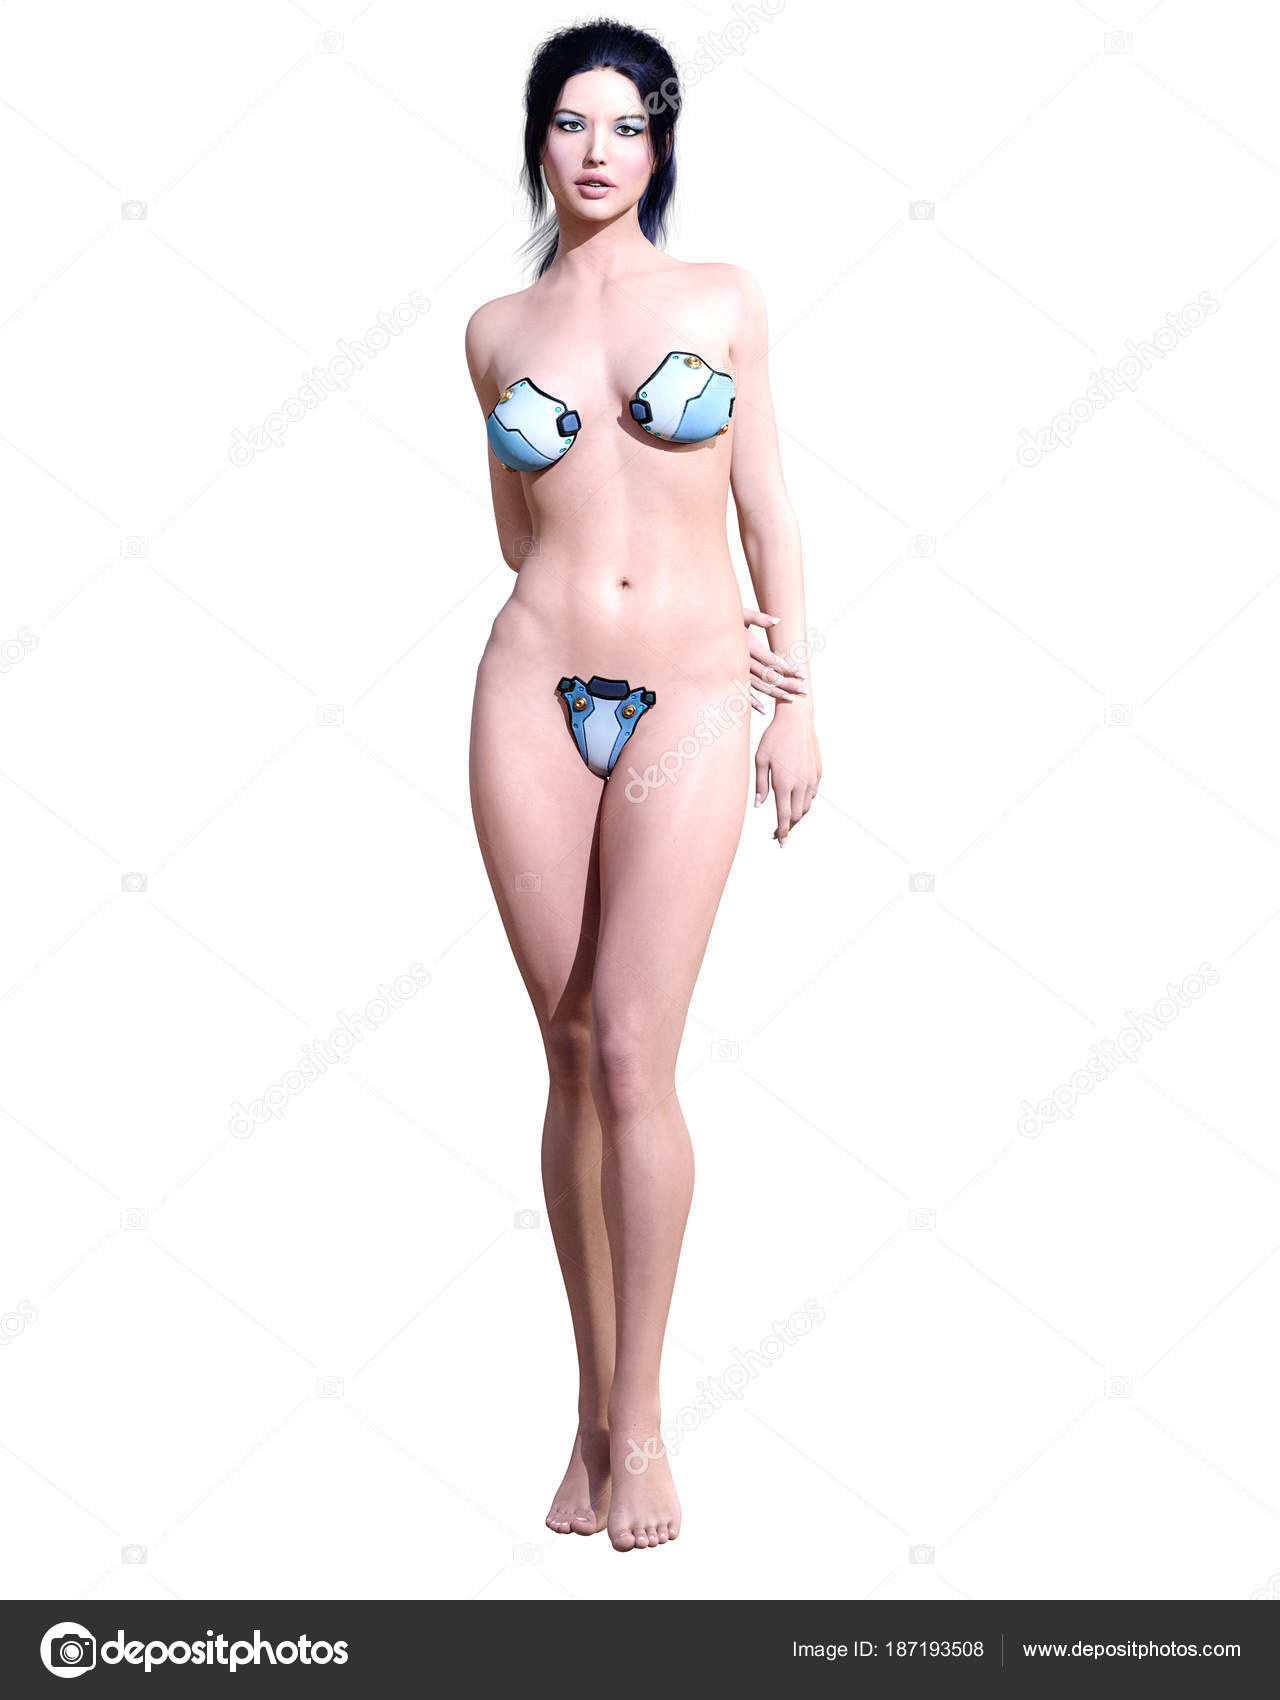 a91784e2d682b depositphotos_187193508-stock-photo-tall-sexy-woman -minimalist-extravagant.jpg